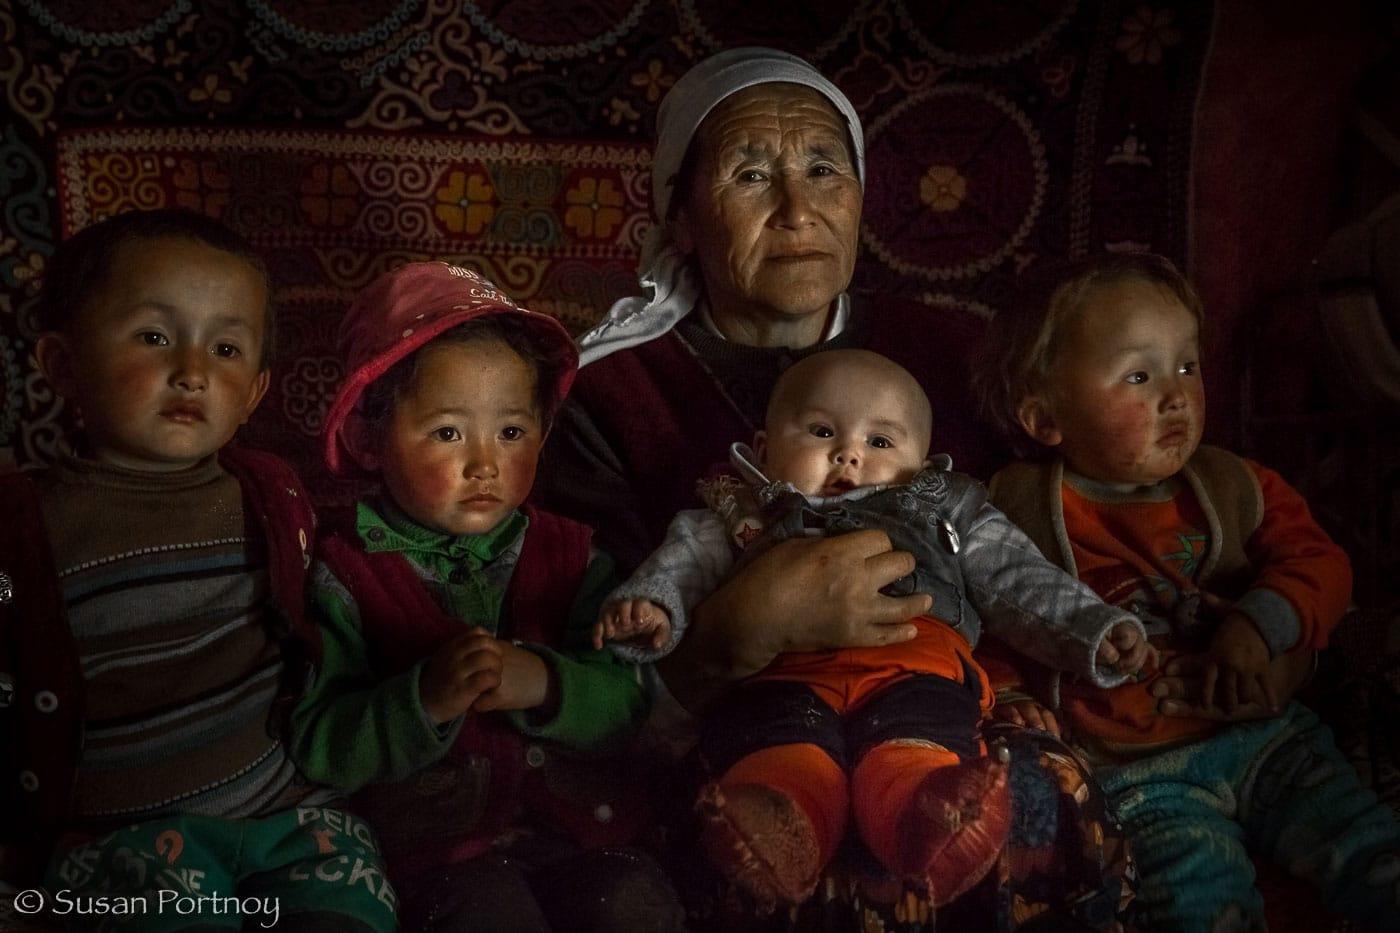 A Kazakh grandmother and her grandchildren in Altai Tavan Bogd National Park, Mongolia-